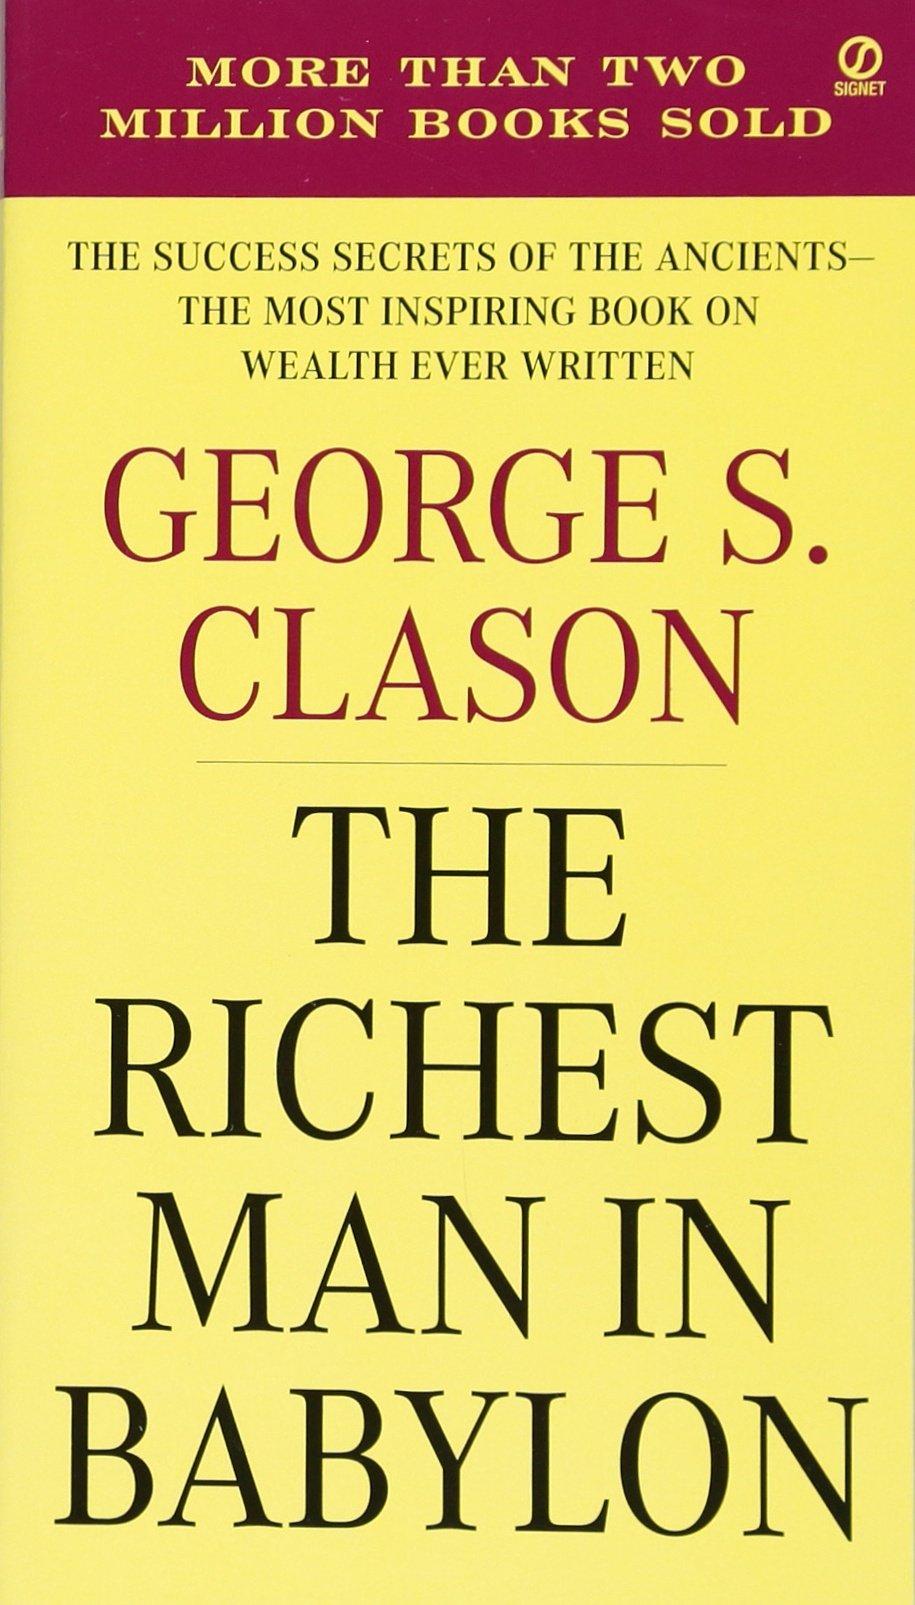 Richest Man Babylon George Clason product image